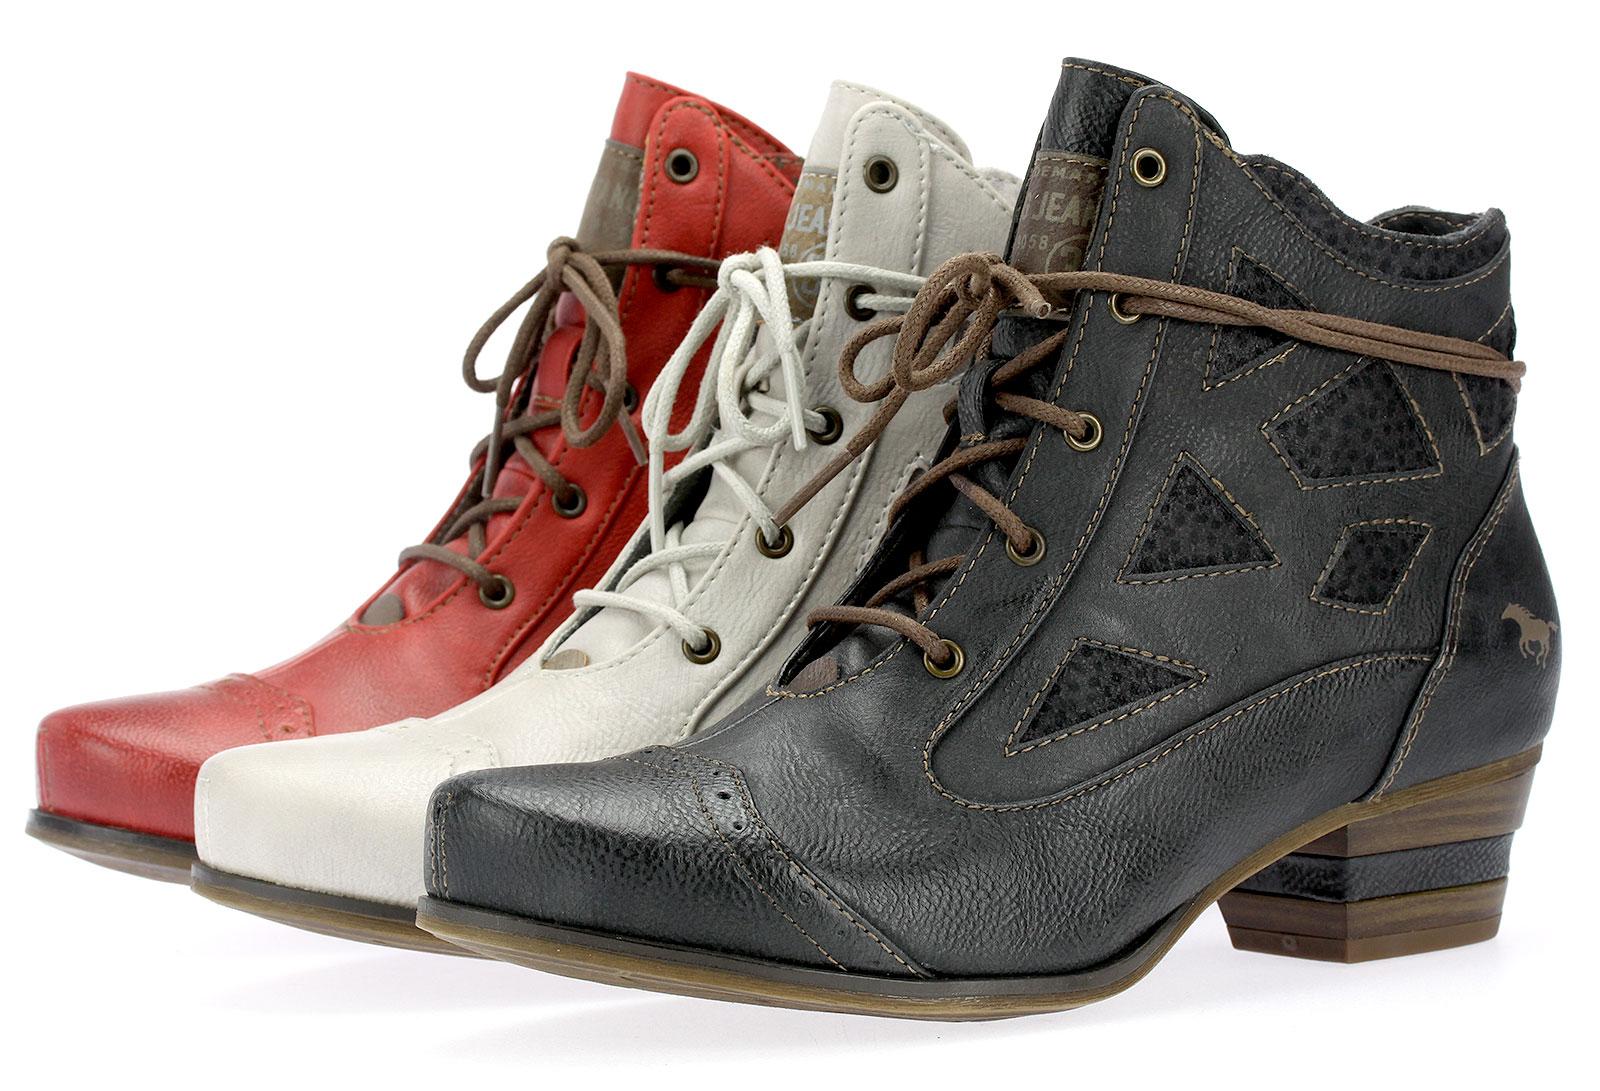 fea860c89f3f Details zu Mustang Damen Stiefeletten Boots Schnürstiefeletten Booty 1187505